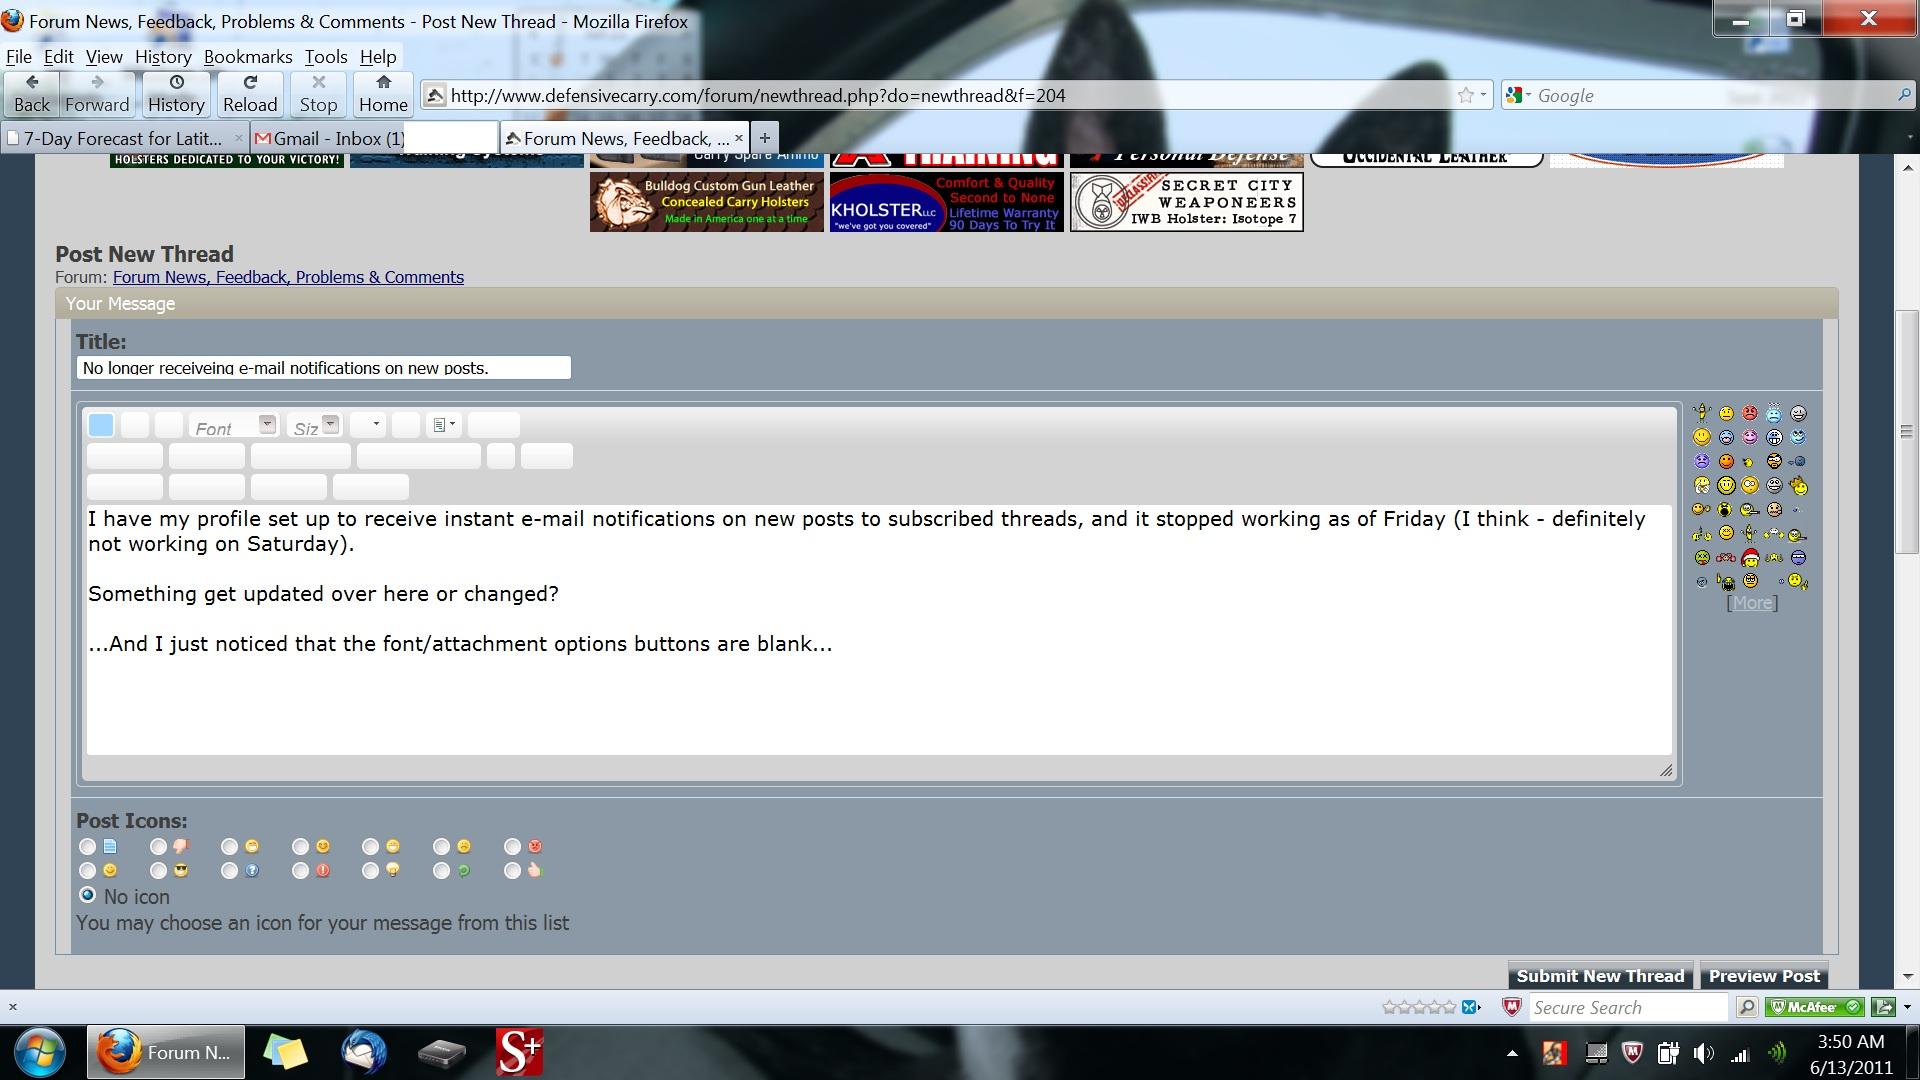 No longer receiveing e-mail notifications on new posts.-dc-screen-shot.jpg